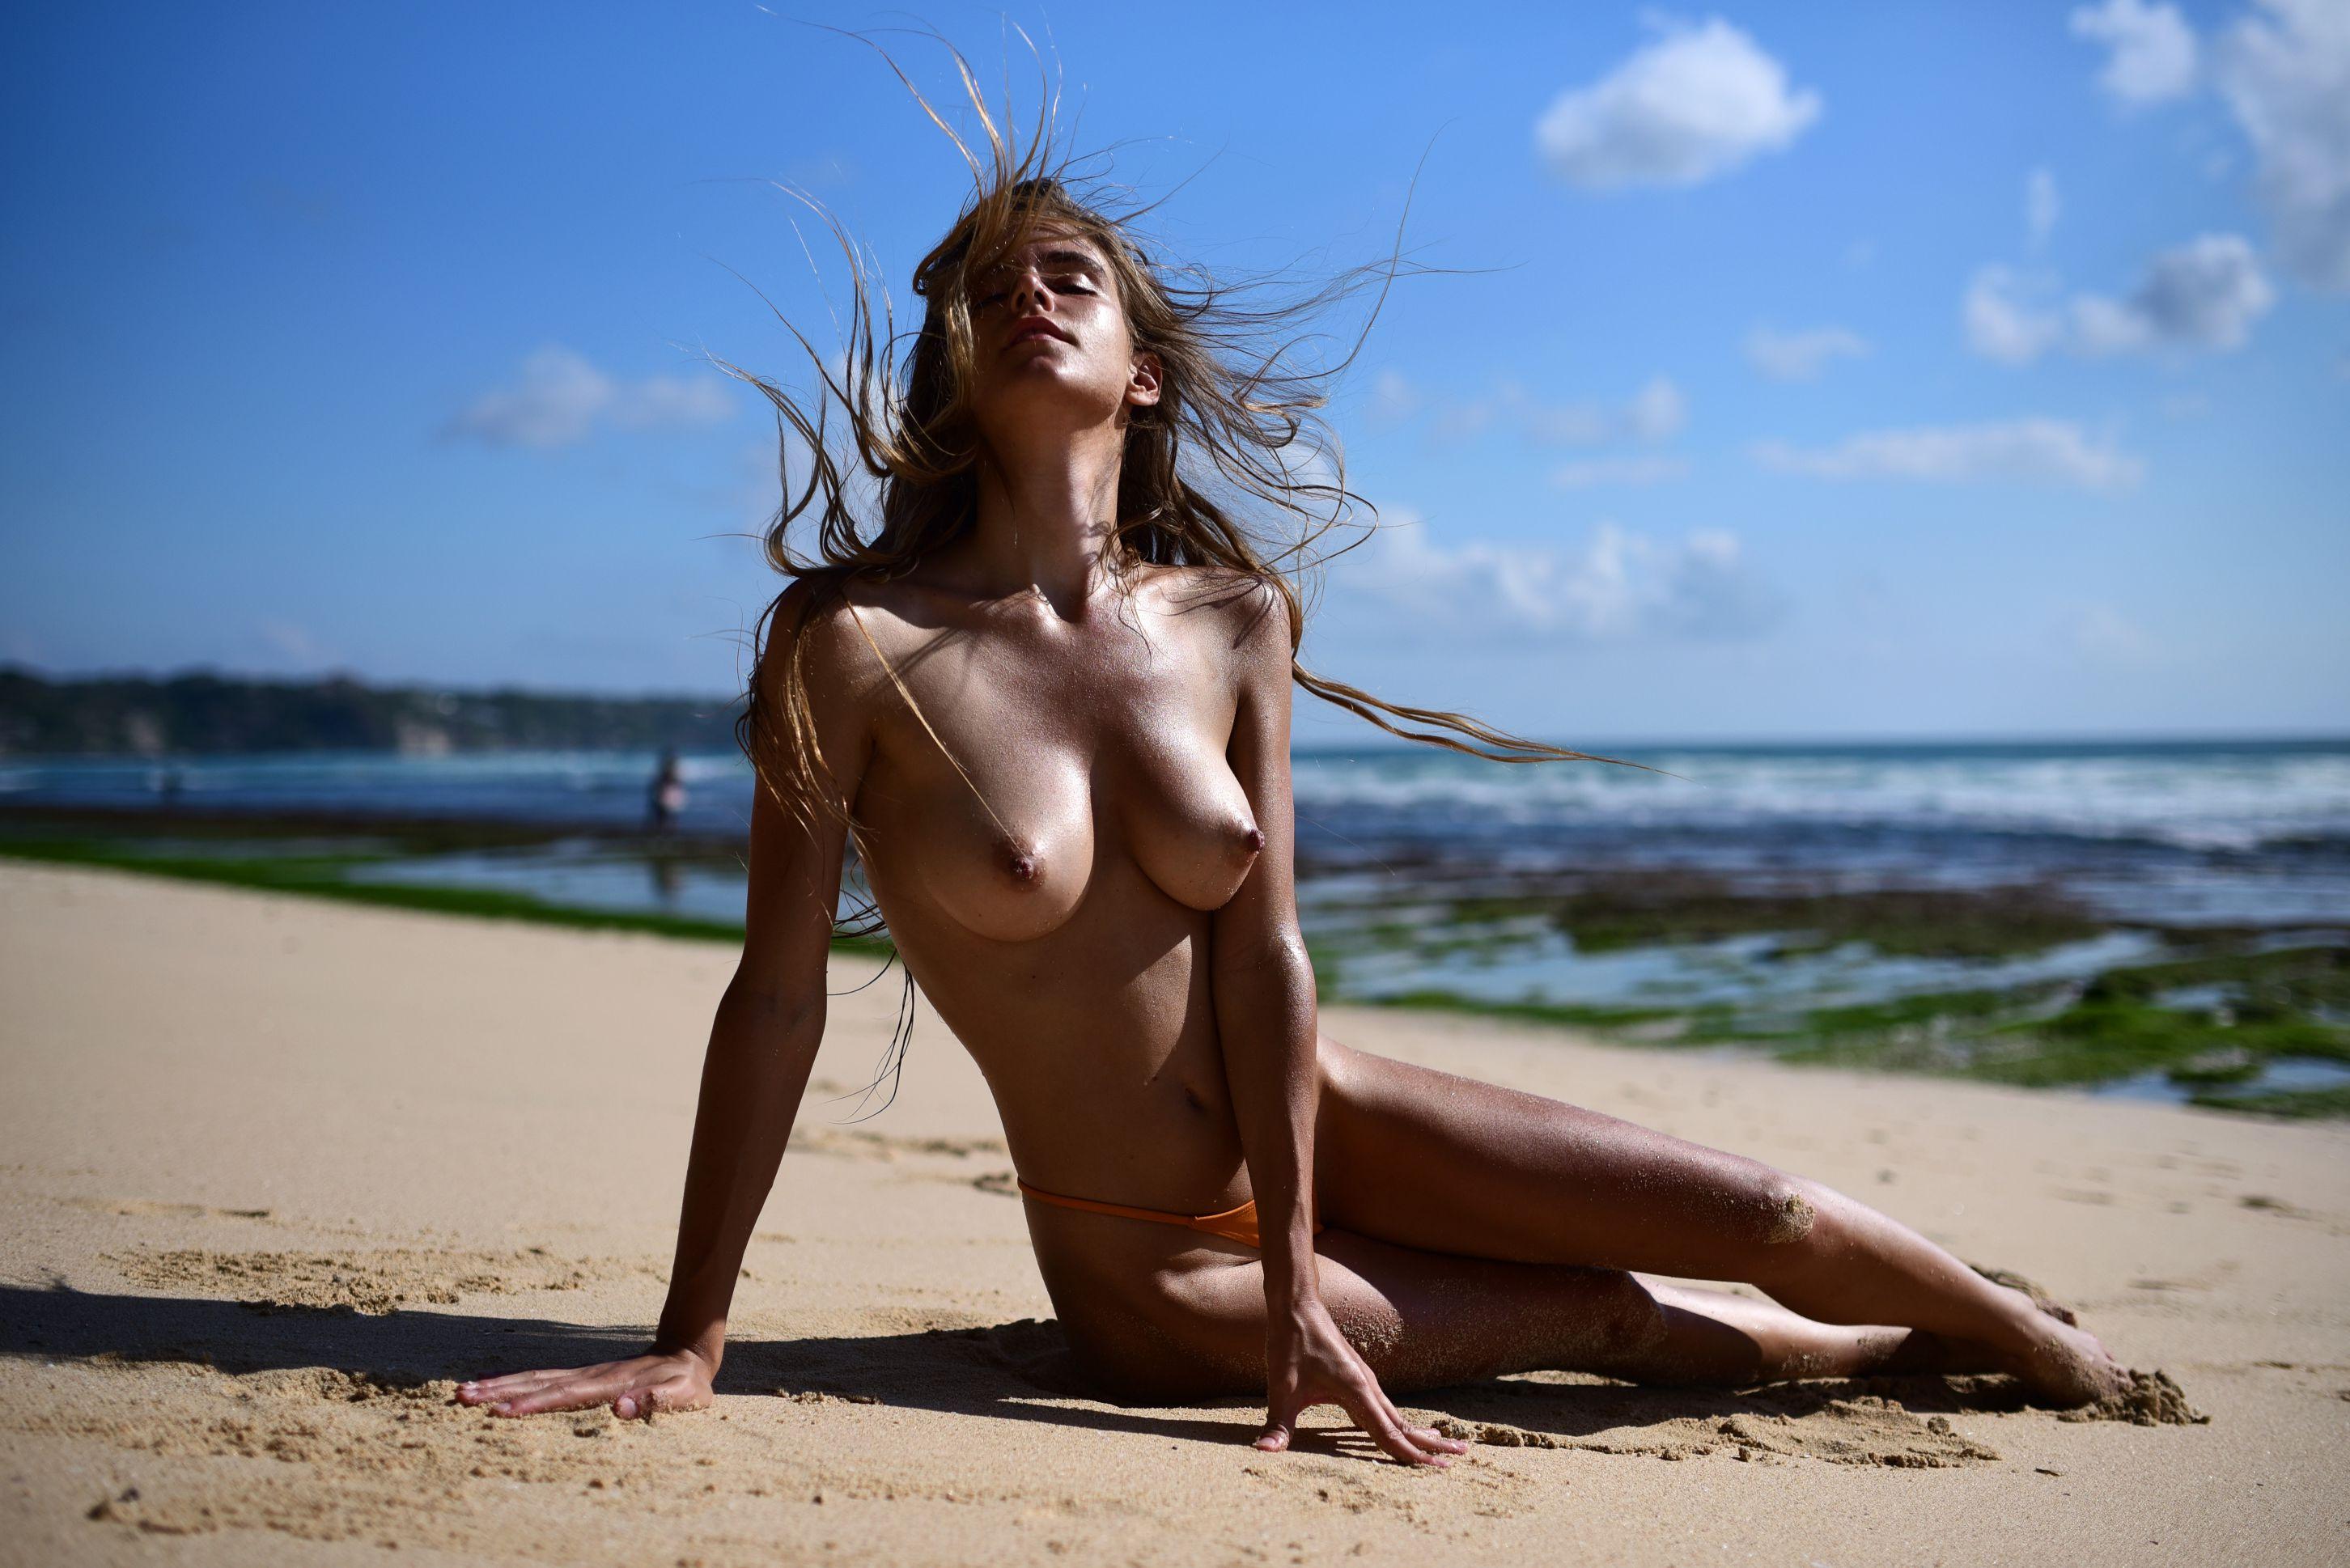 Naked balli beach girls #12